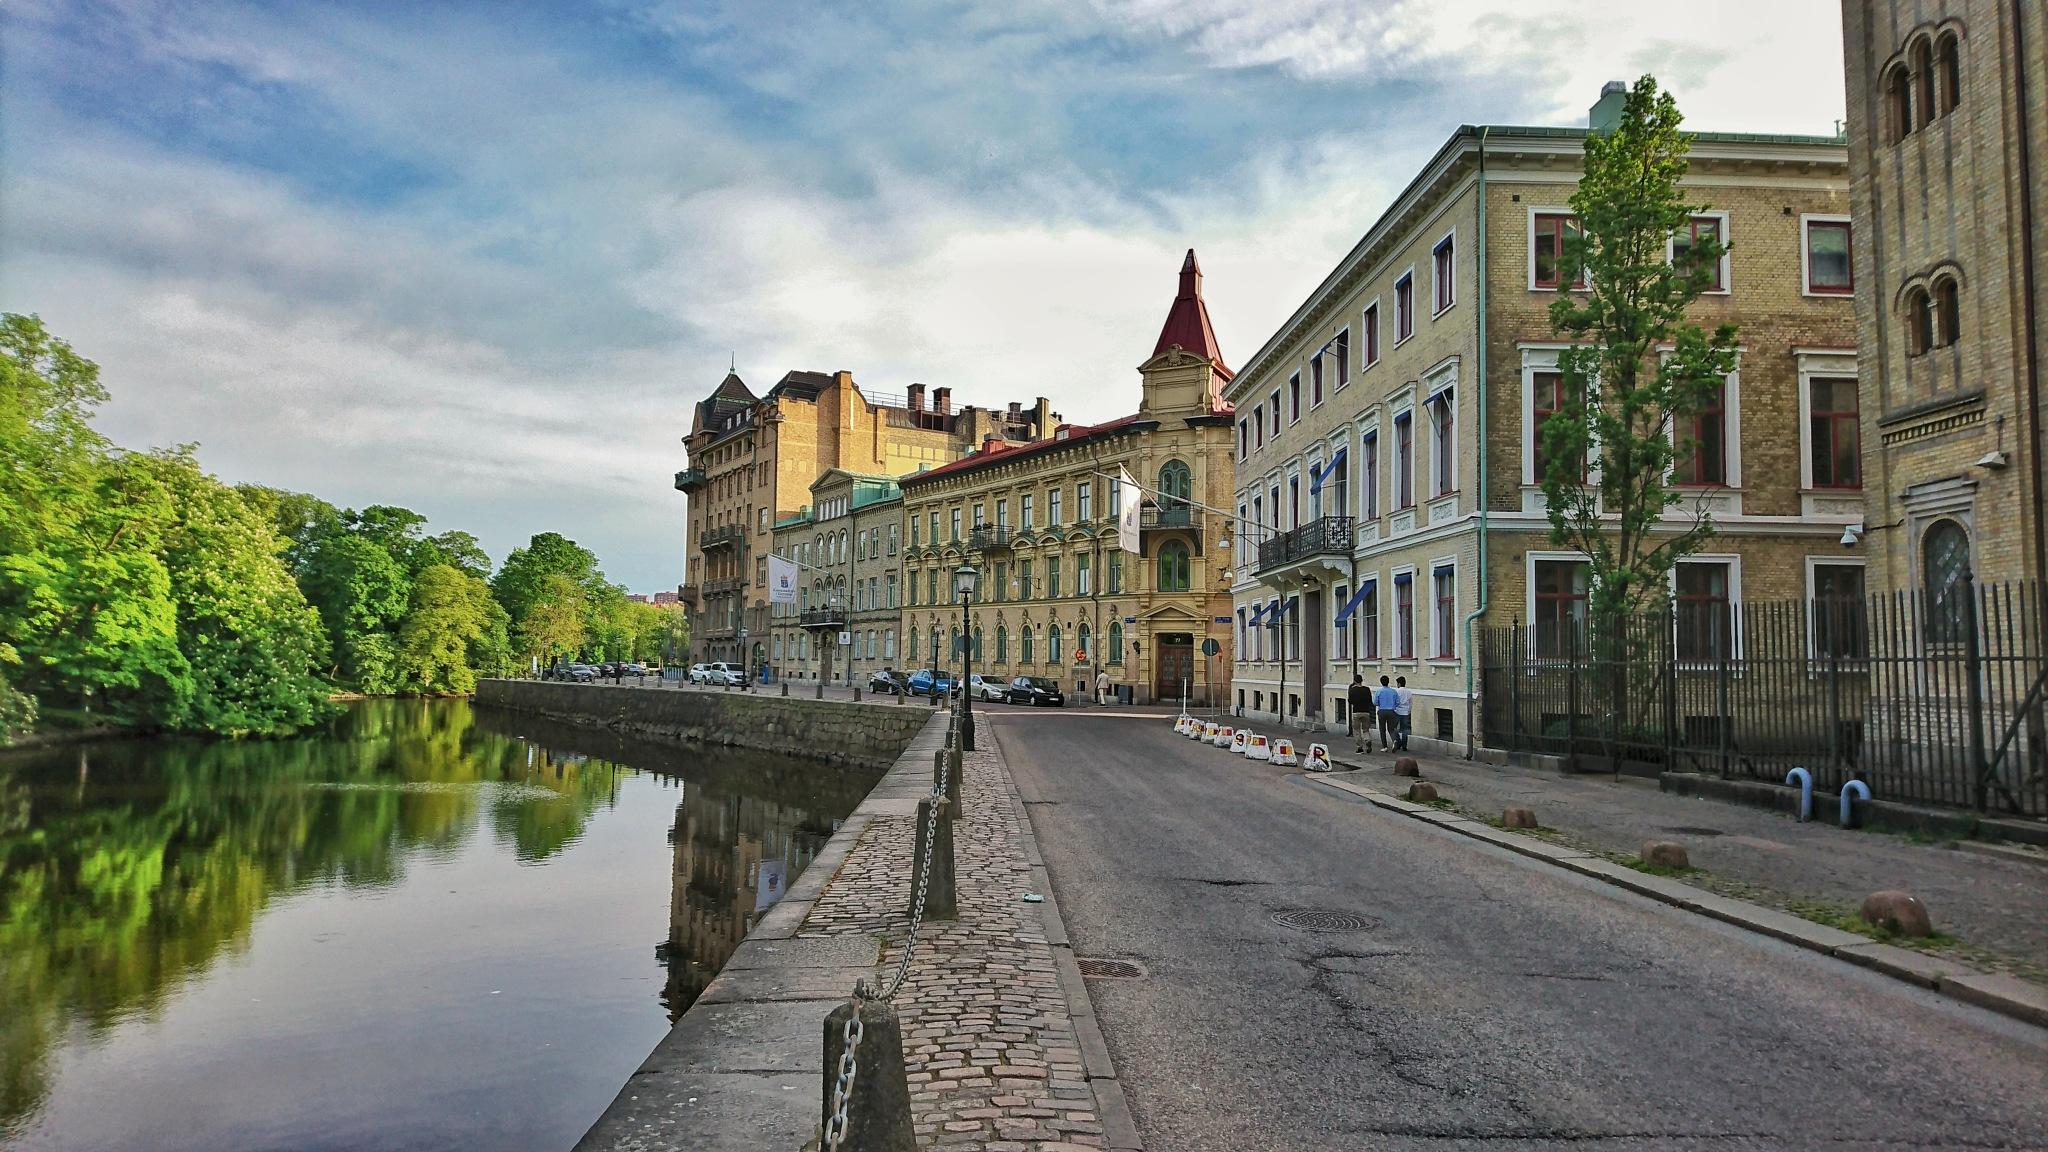 Gothenburg 2 by Krister Honkonen